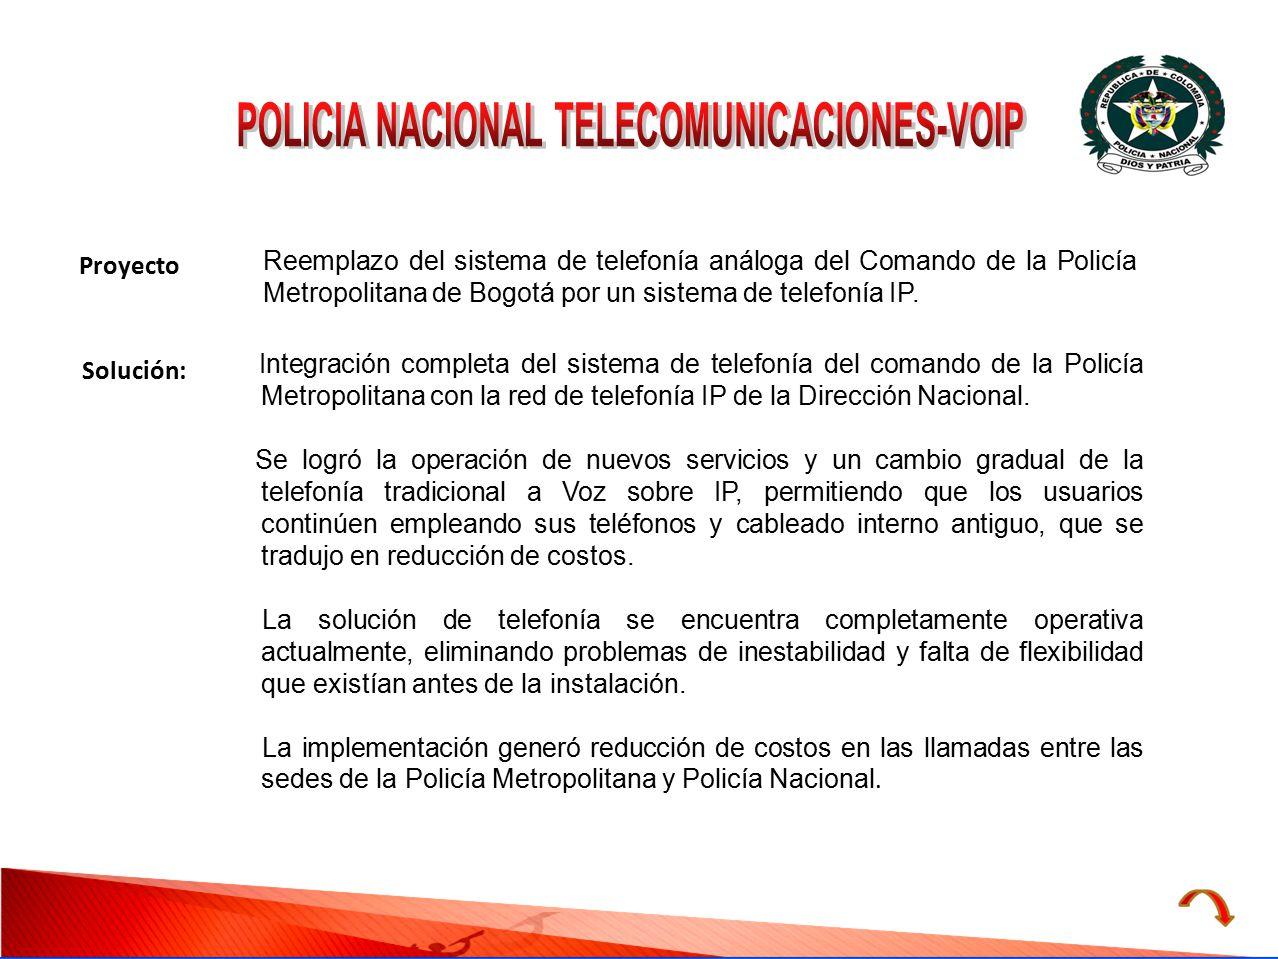 POLICIA NACIONAL TELECOMUNICACIONES-VOIP